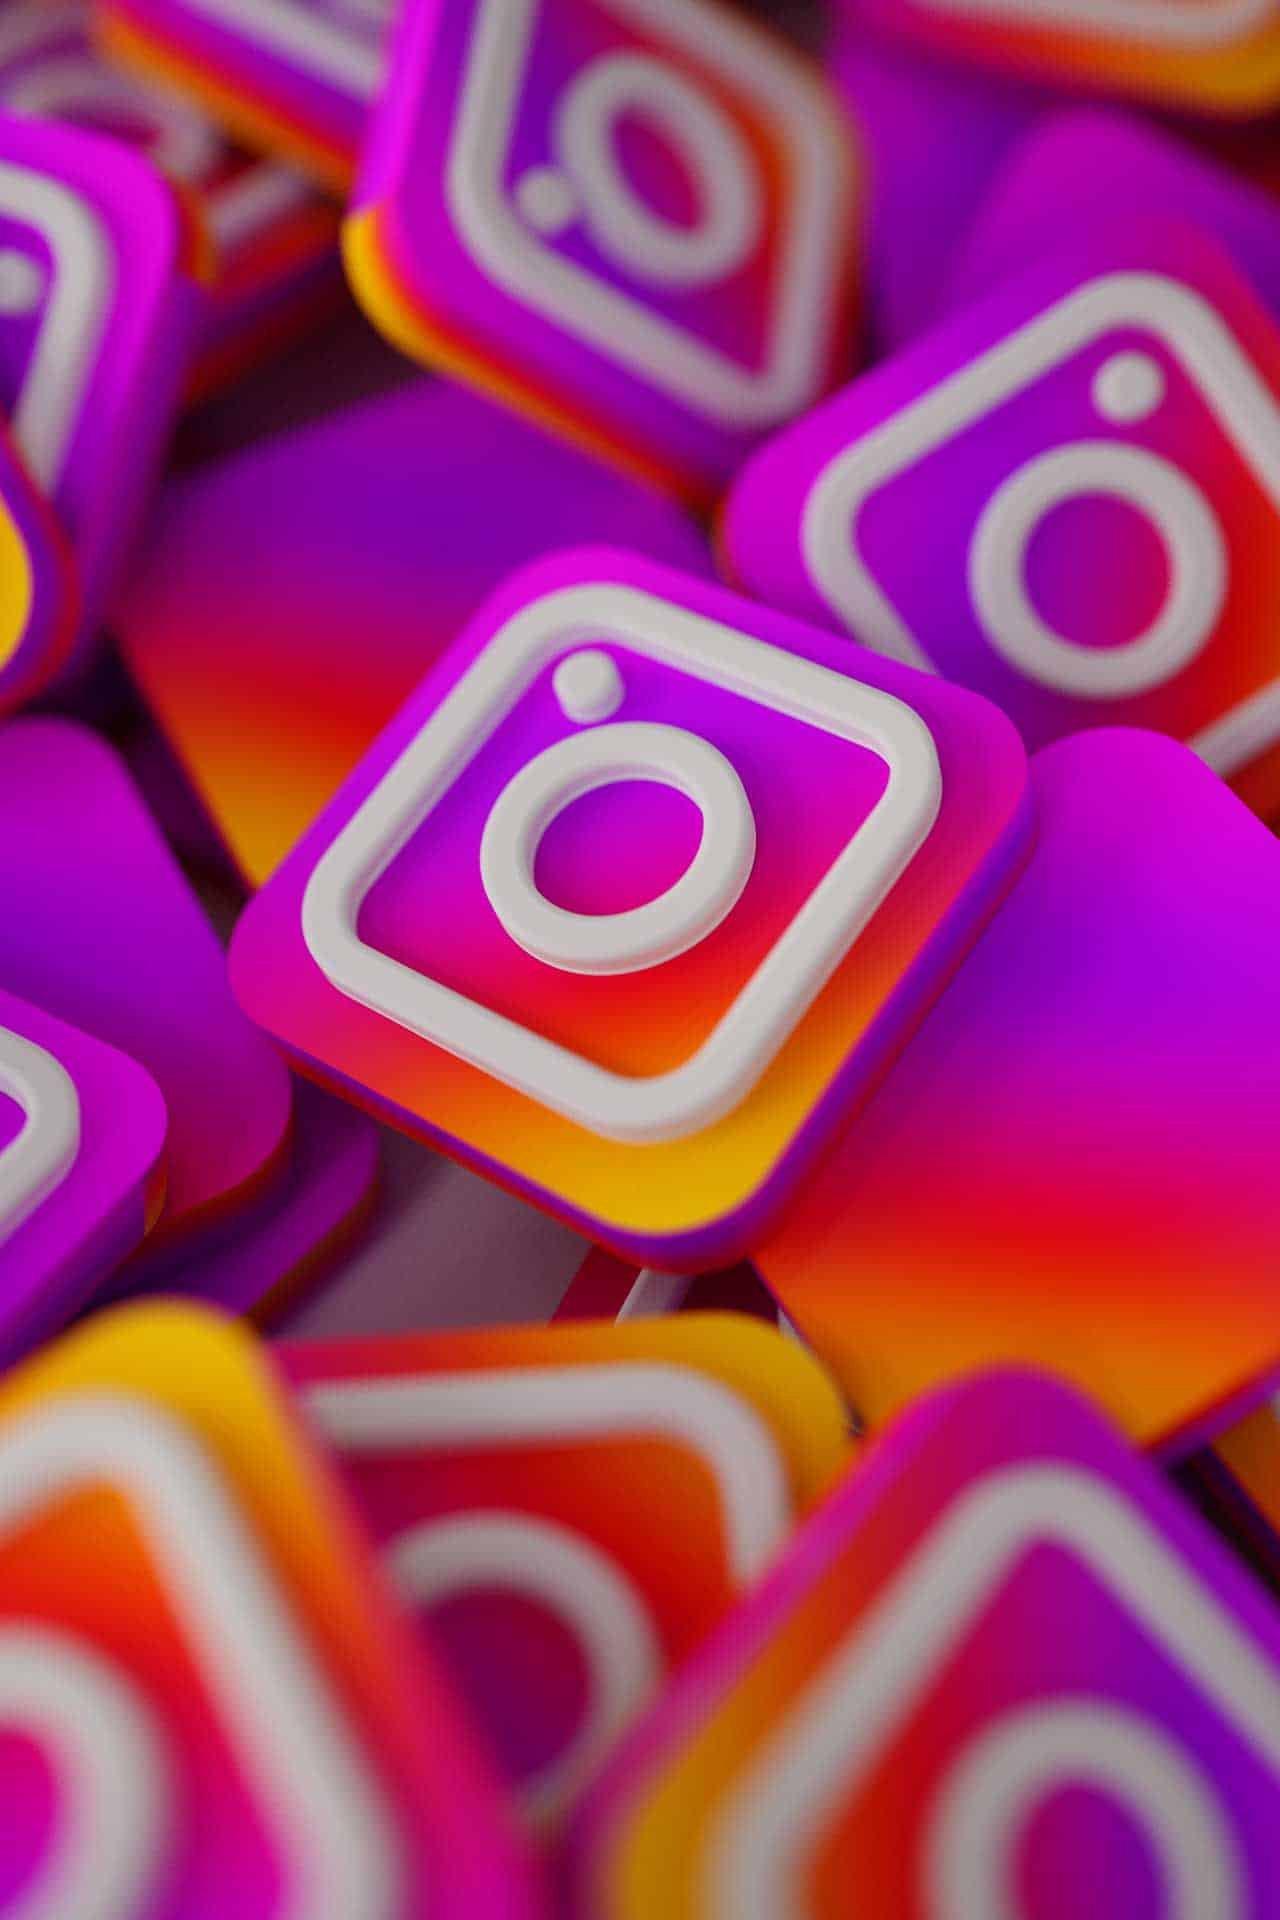 instagram si rinnova